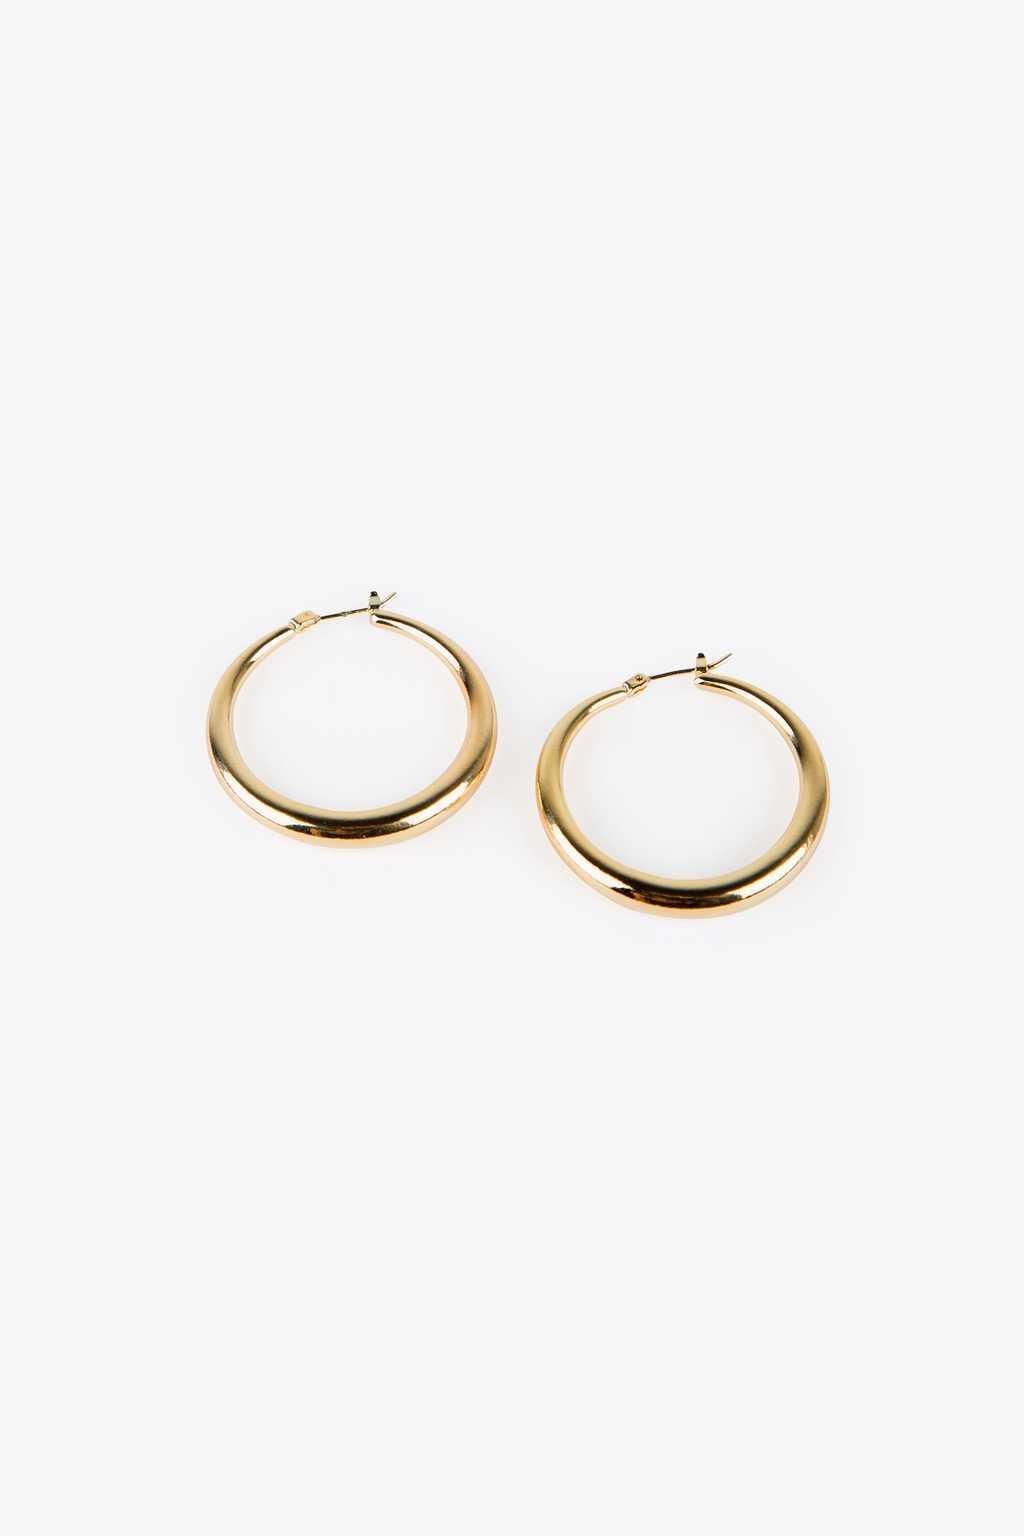 Earring H131 Gold 1